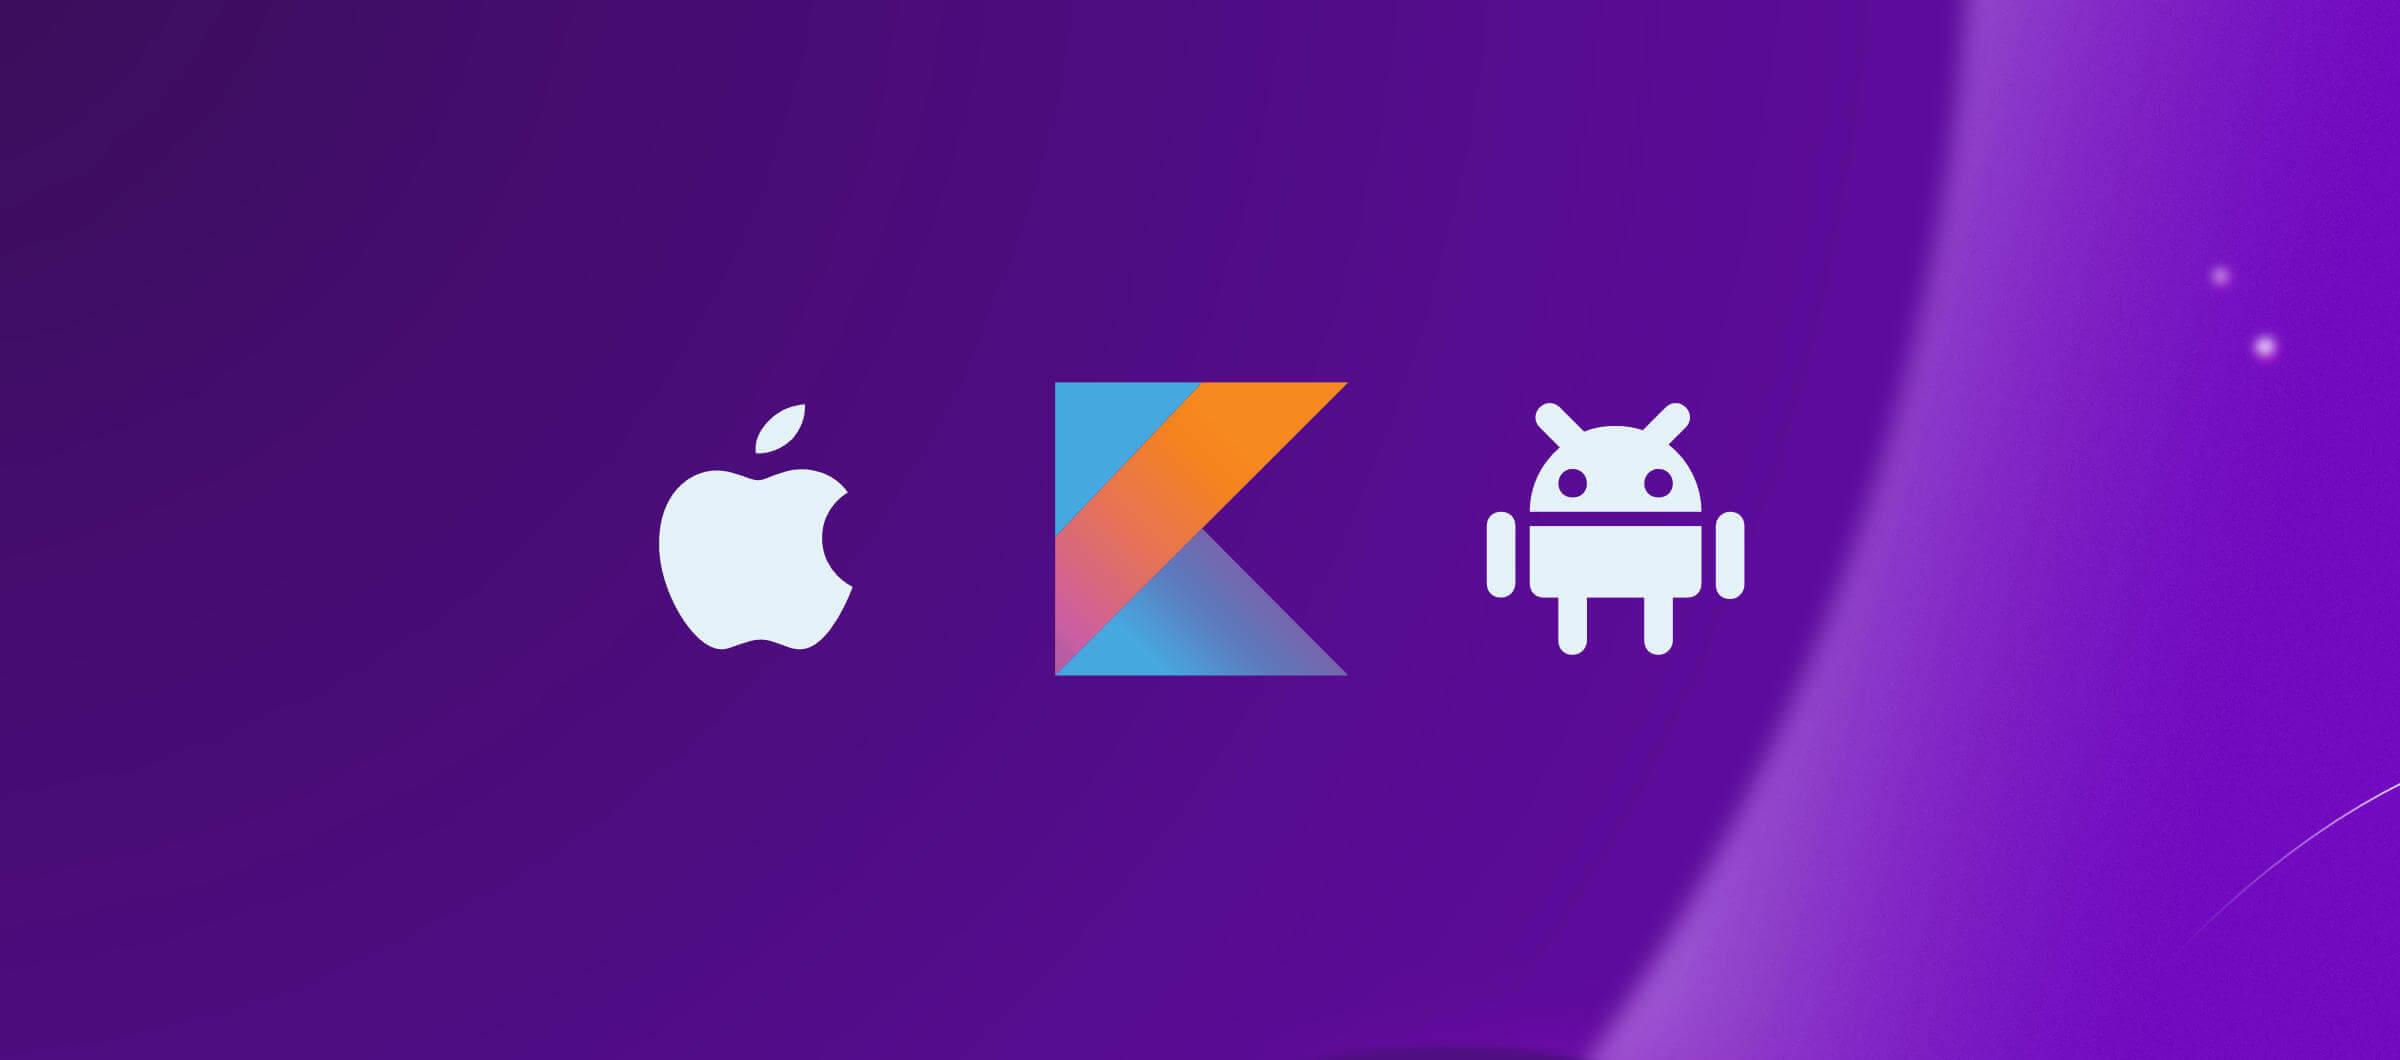 Kotlin Multiplatform Mobile (KMM): more CI/CD tips and tricks